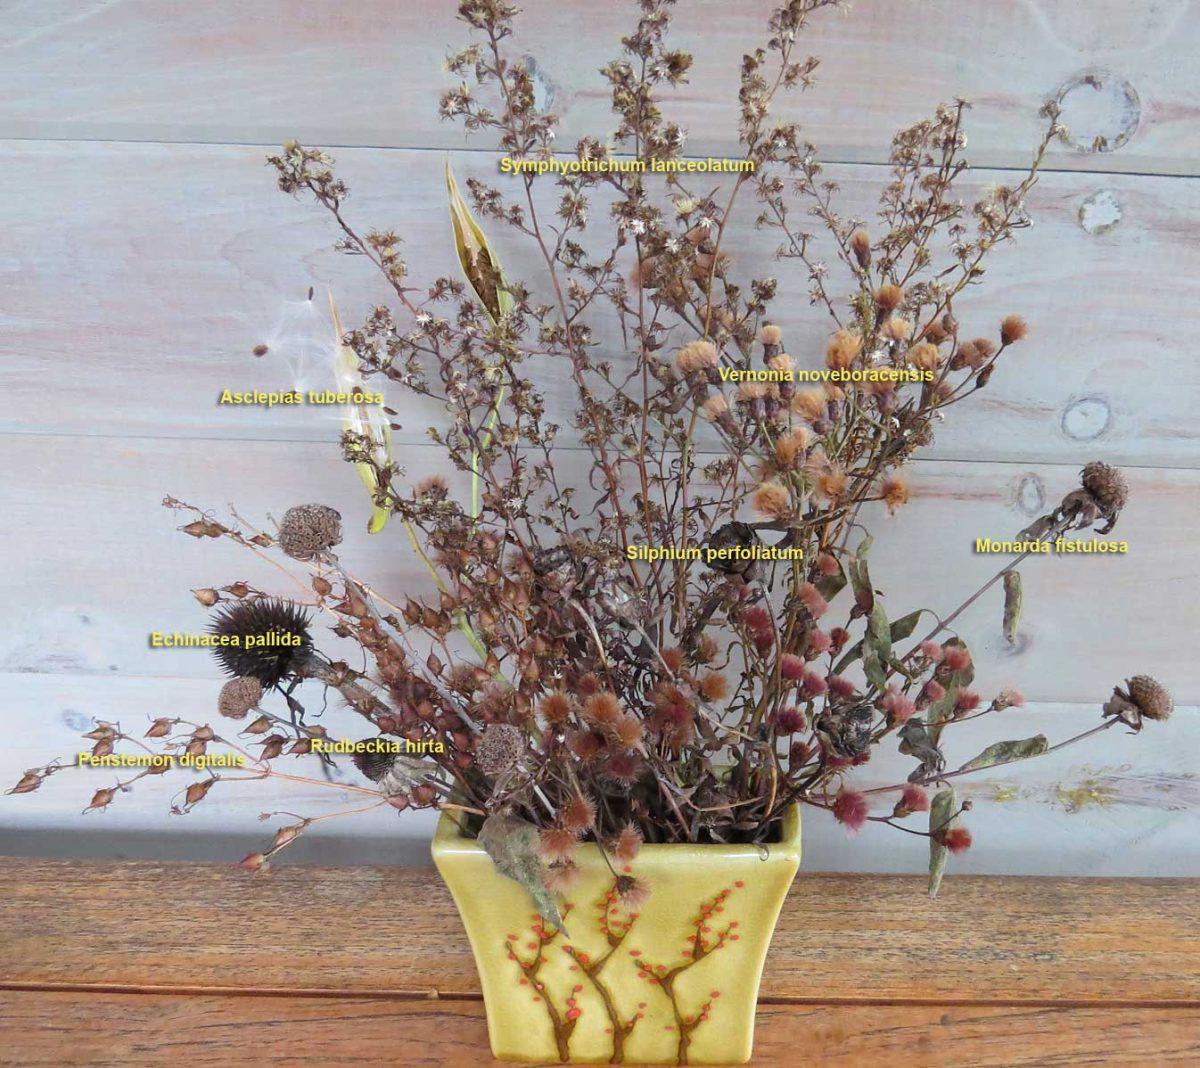 Bouquet-November meadow seedheads-Lake Muskoka